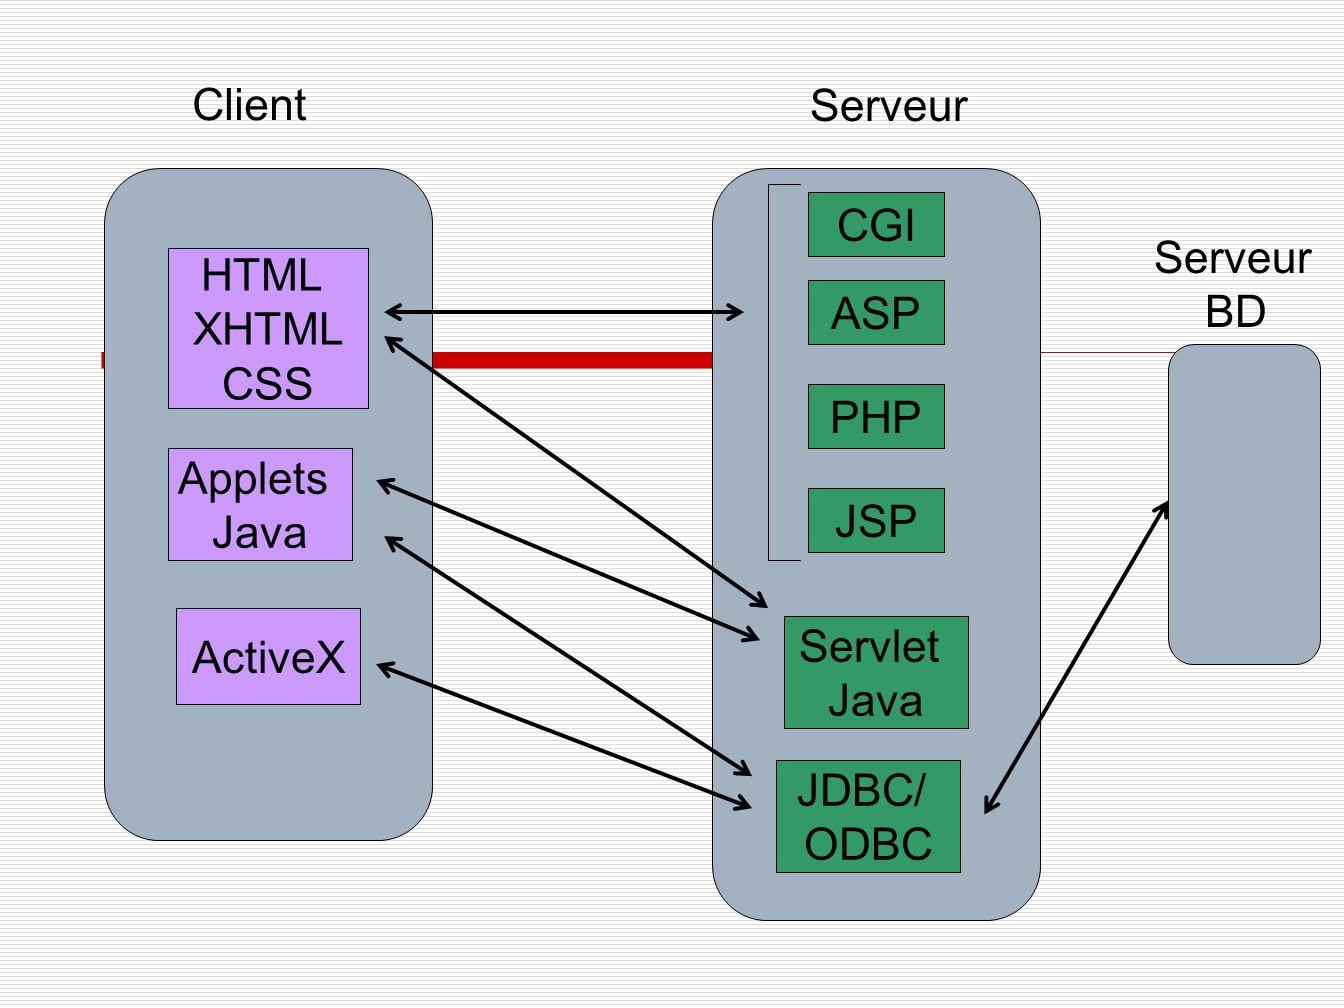 Client Serveur HTML XHTML CSS Applets Java ActiveX Servlet Java CGI ASP PHP JSP Serveur BD JDBC/ ODBC